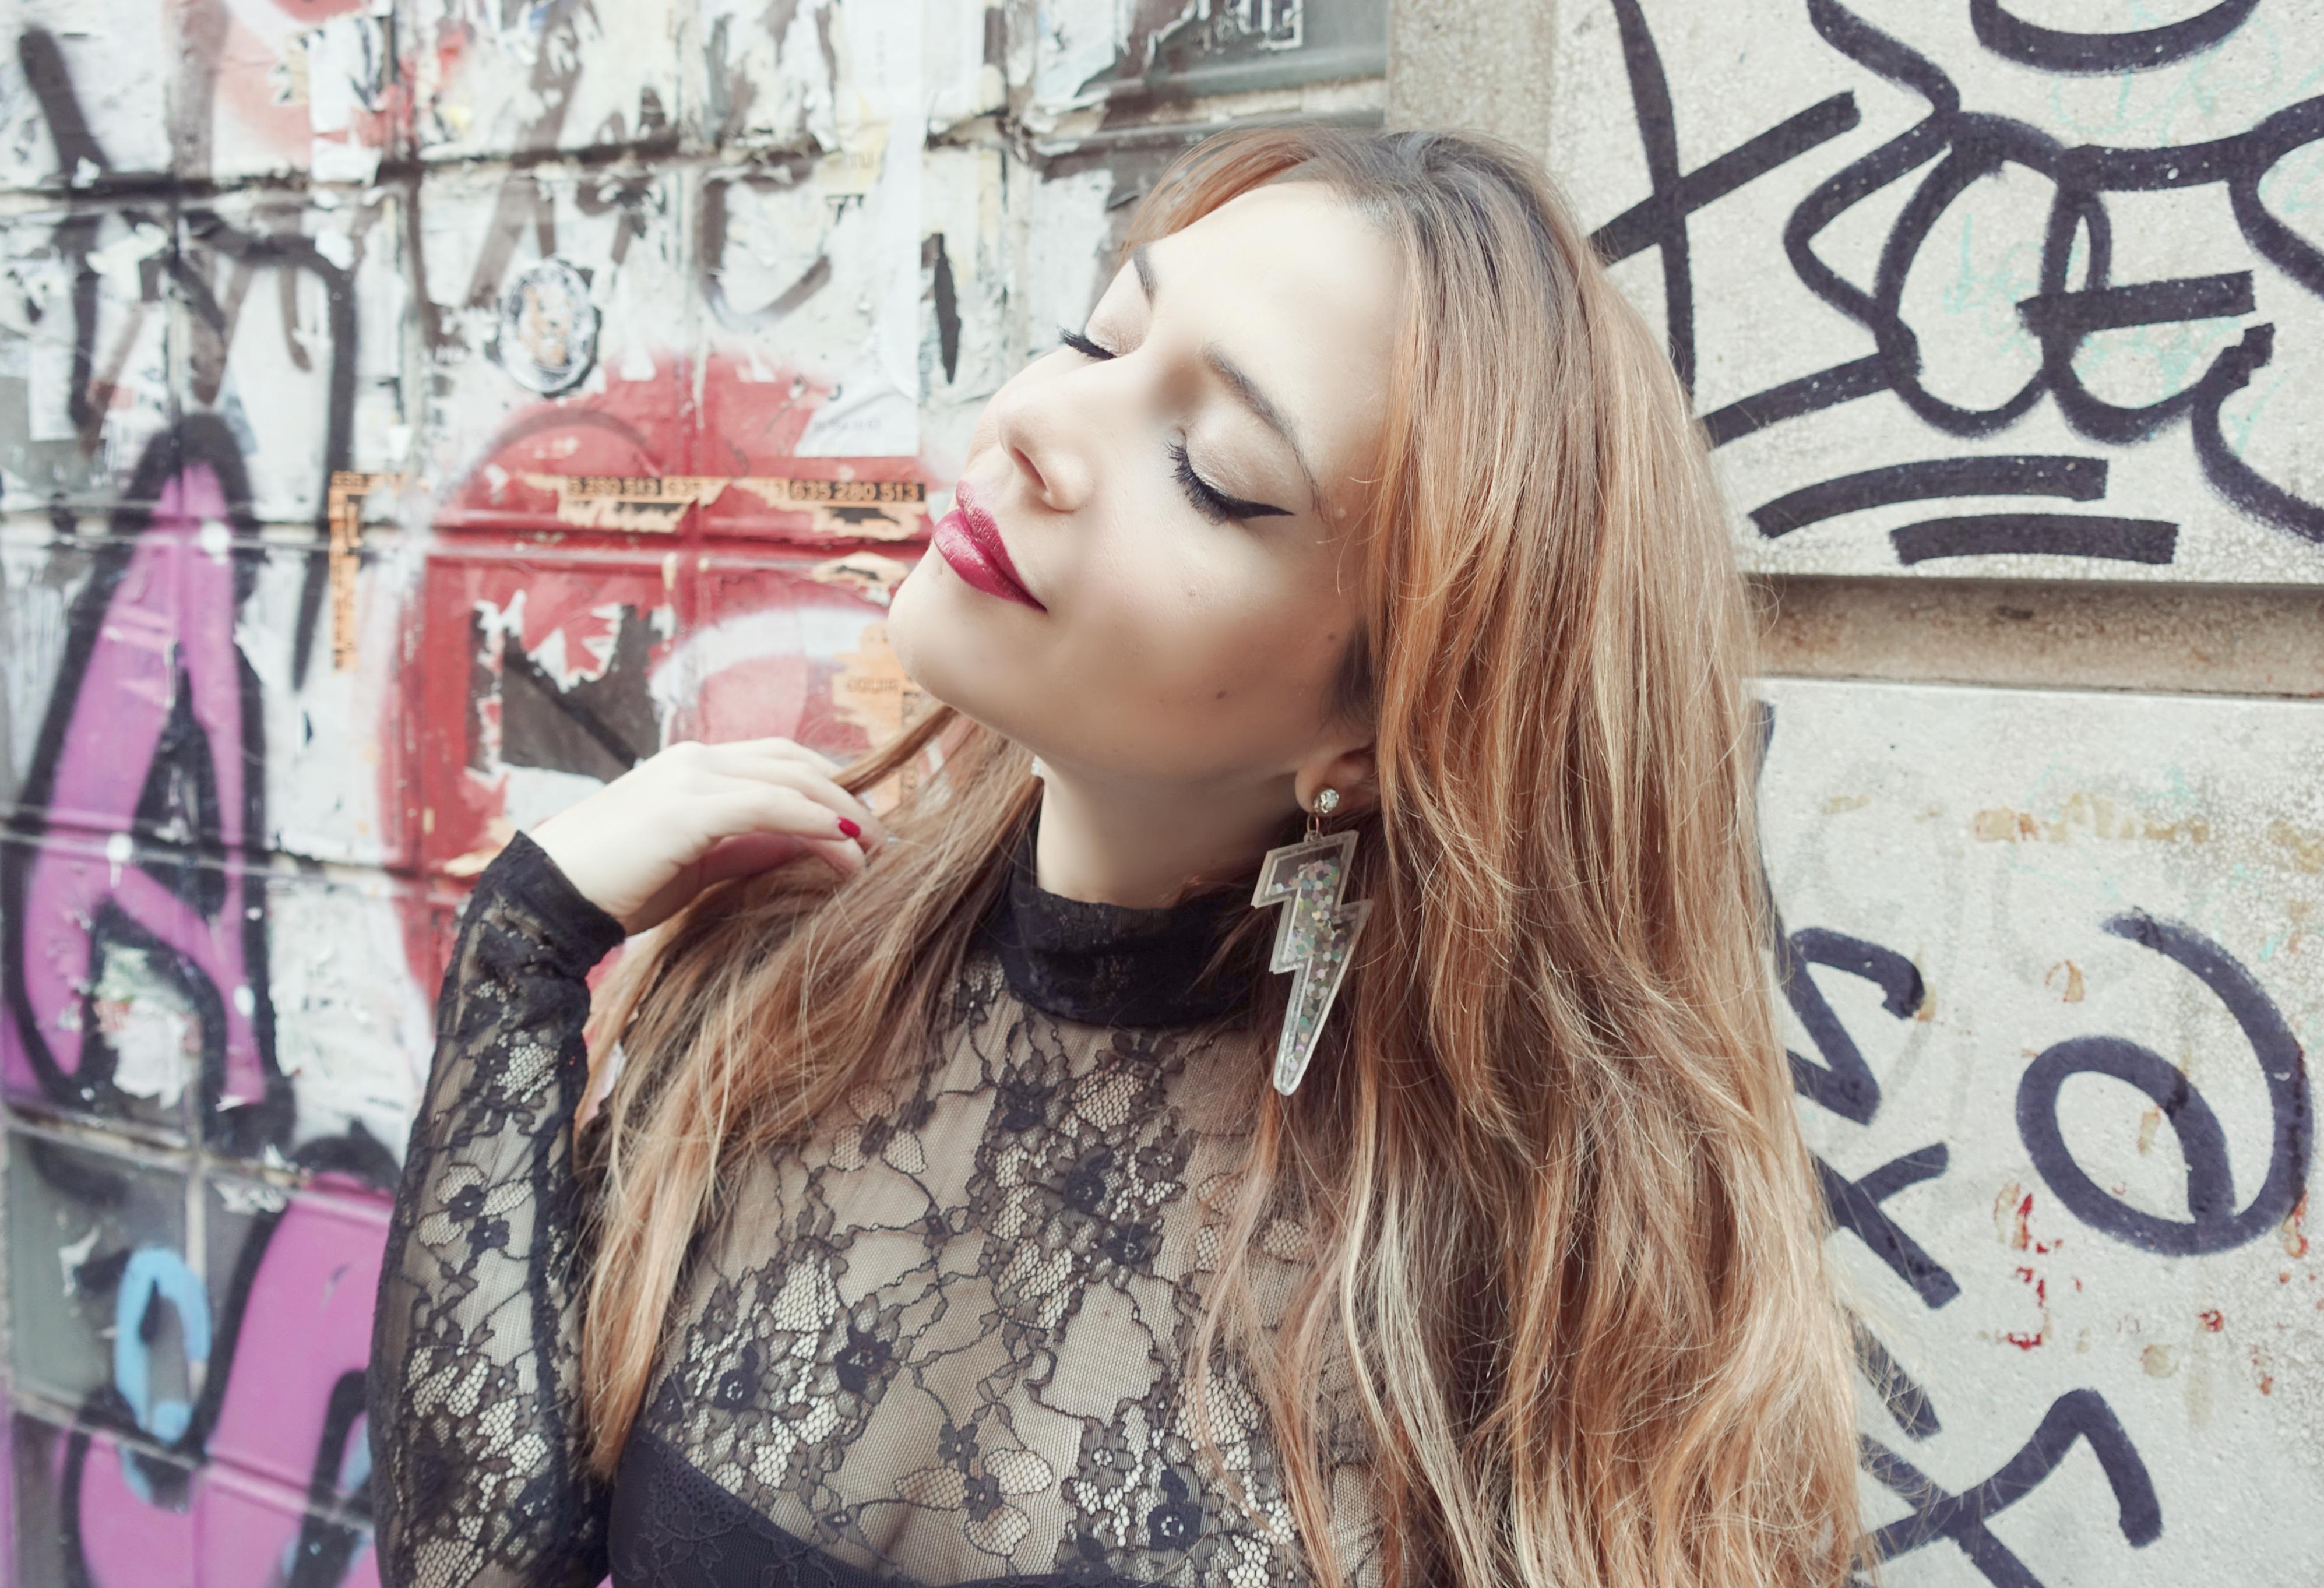 Pendientes-largos-blog-de-moda-Chicadicta-PiensaenChic-influencer-fashionista-Primark-look-pretty-blogger-madrid-Piensa-en-Chic-body-Chic-adicta